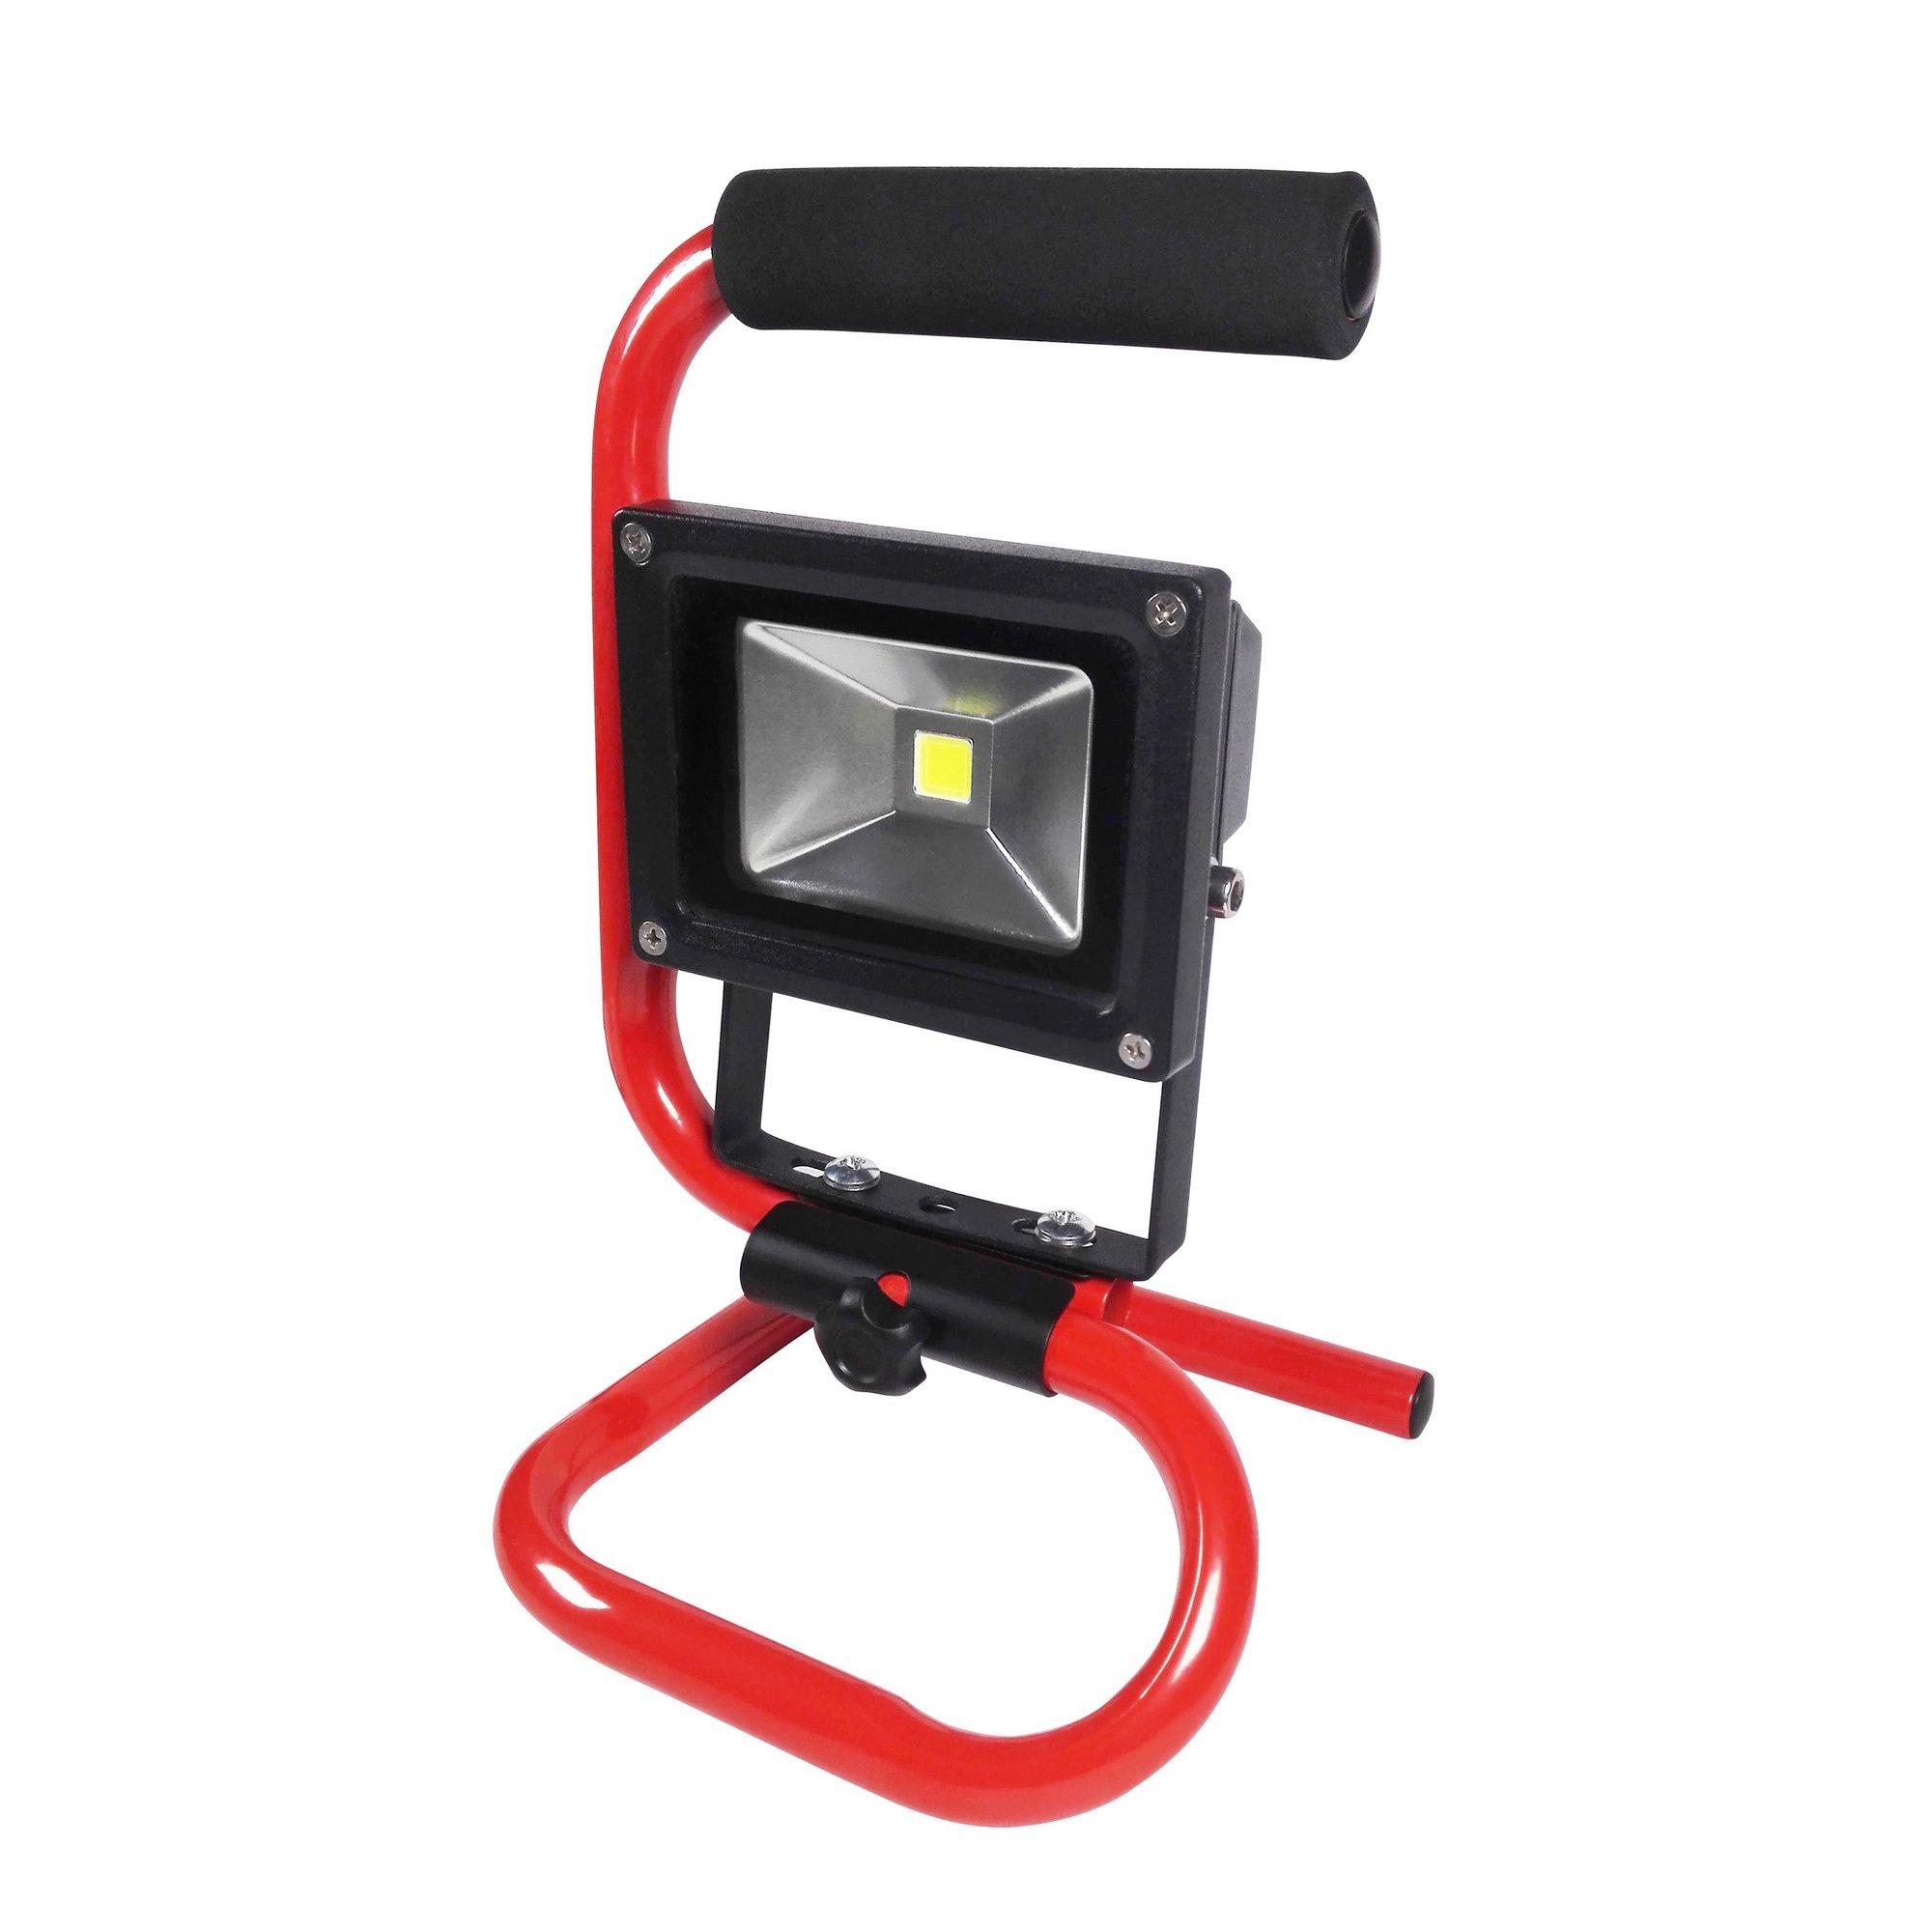 Image of 230V 10W LED Portable Worklight